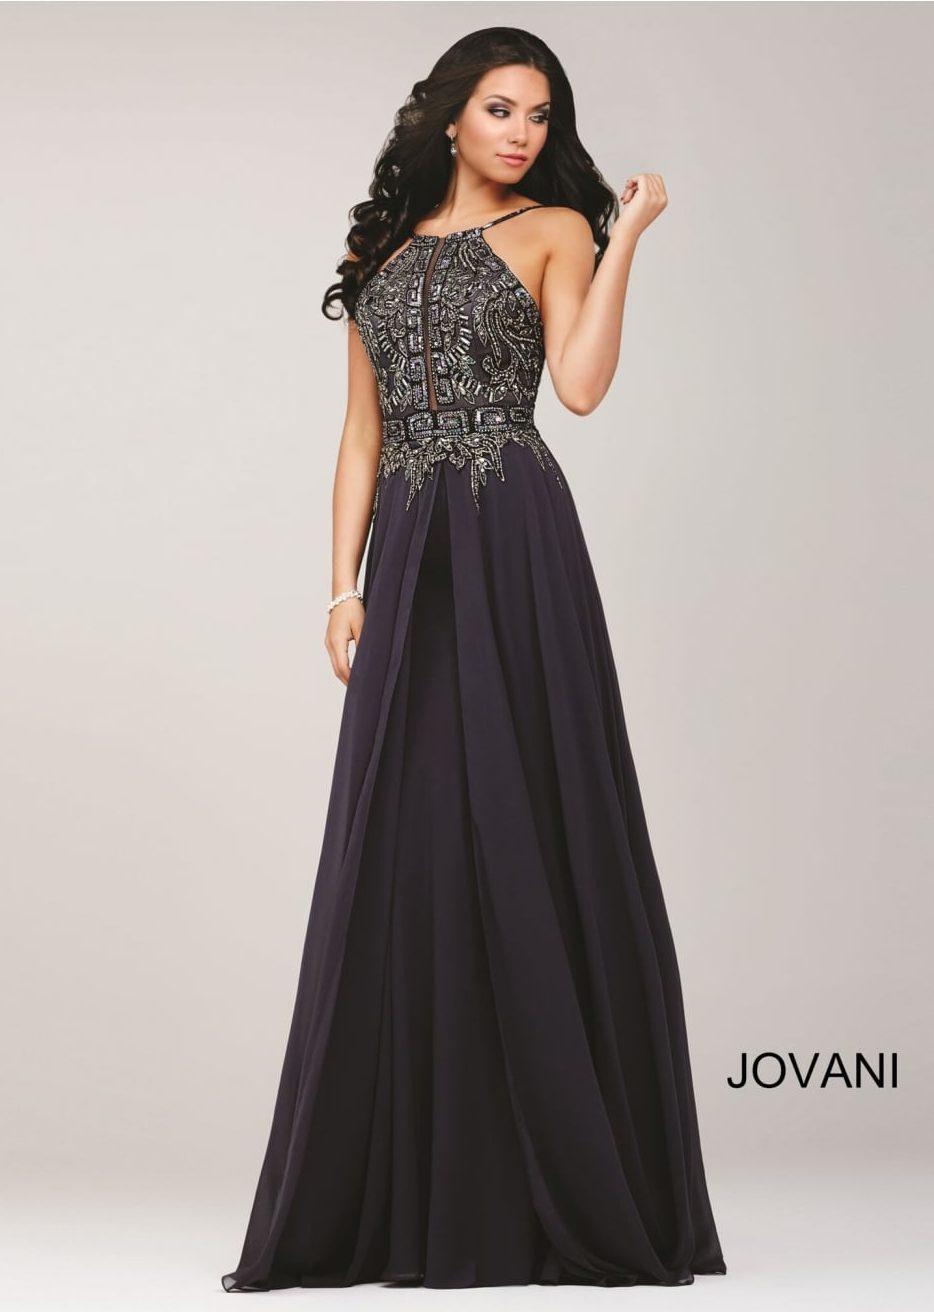 Jovani 33851 Prom Dress